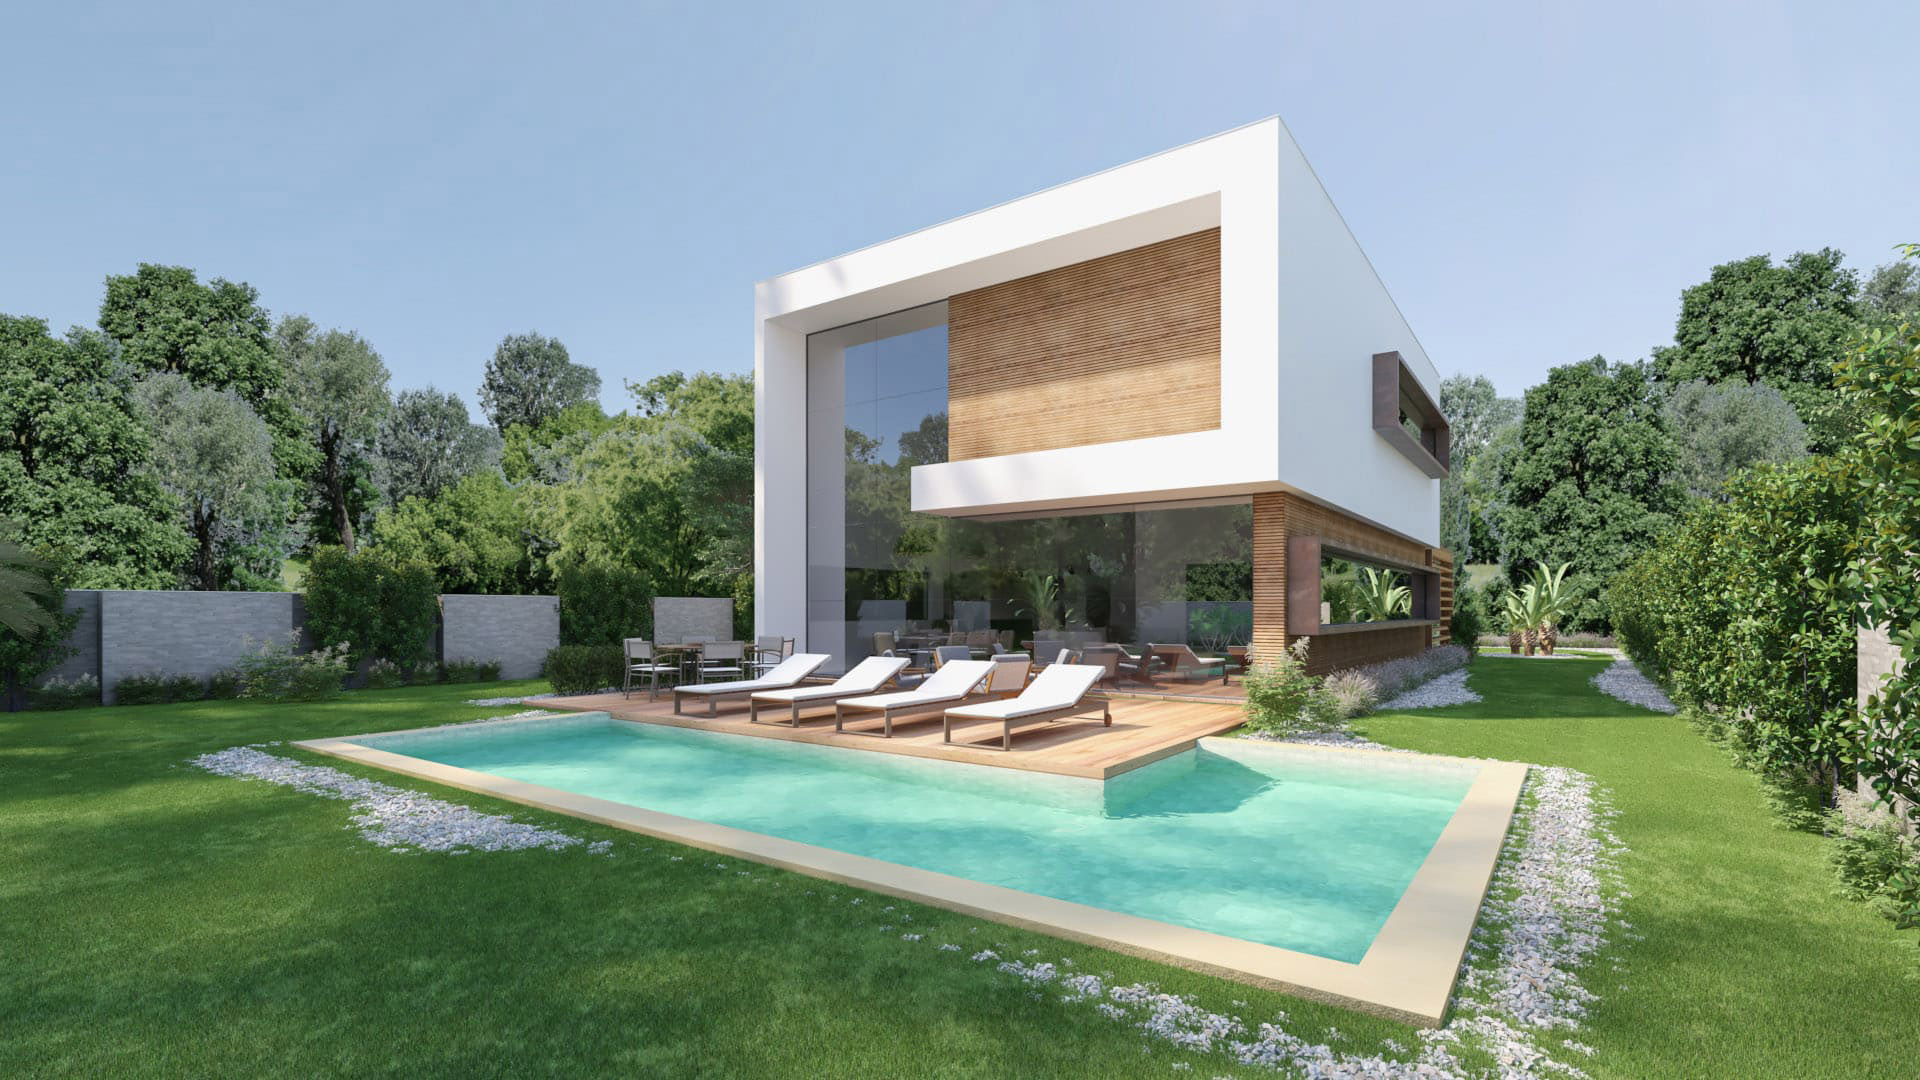 Exemplo de moradia / SILFIDUCIA real estate